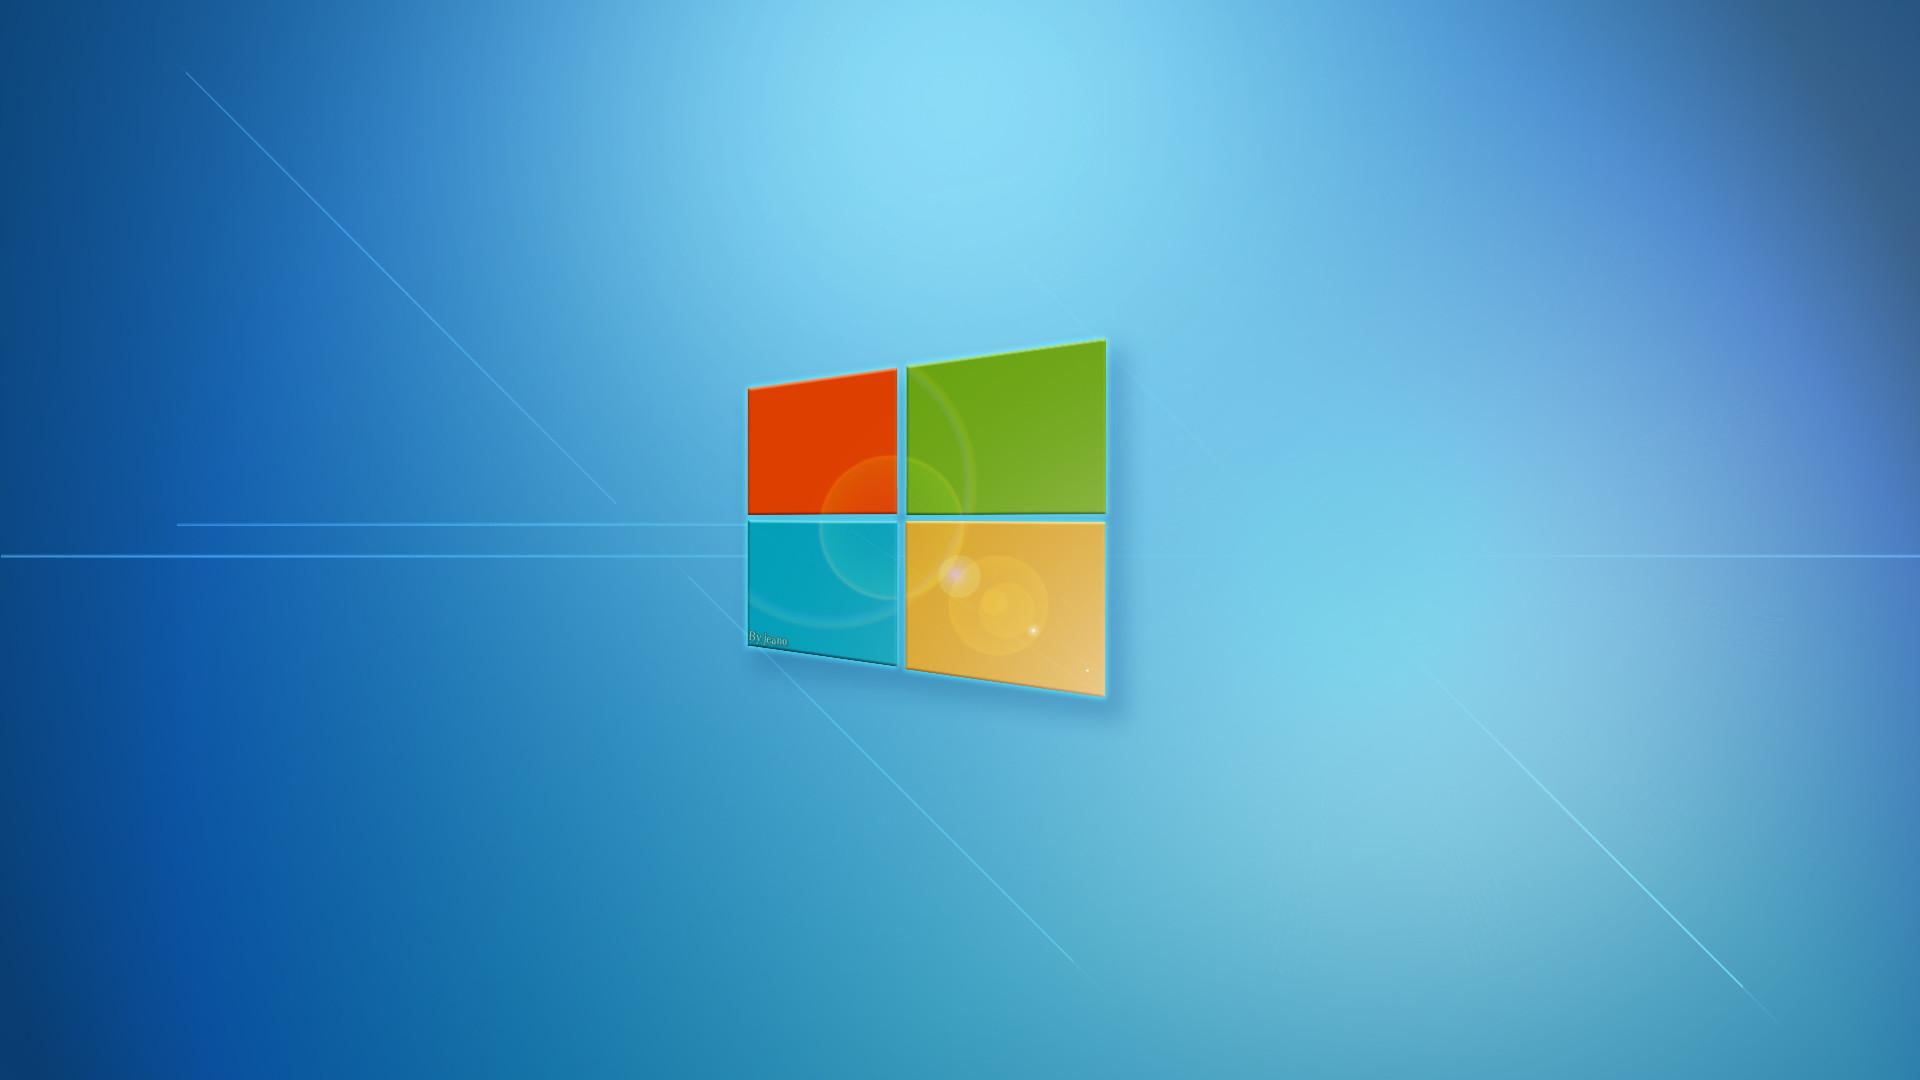 Windows New Theme HD desktop wallpaper : High Definition : Mobile Windows 8  HD Desktop Wallpapers Wallpapers)